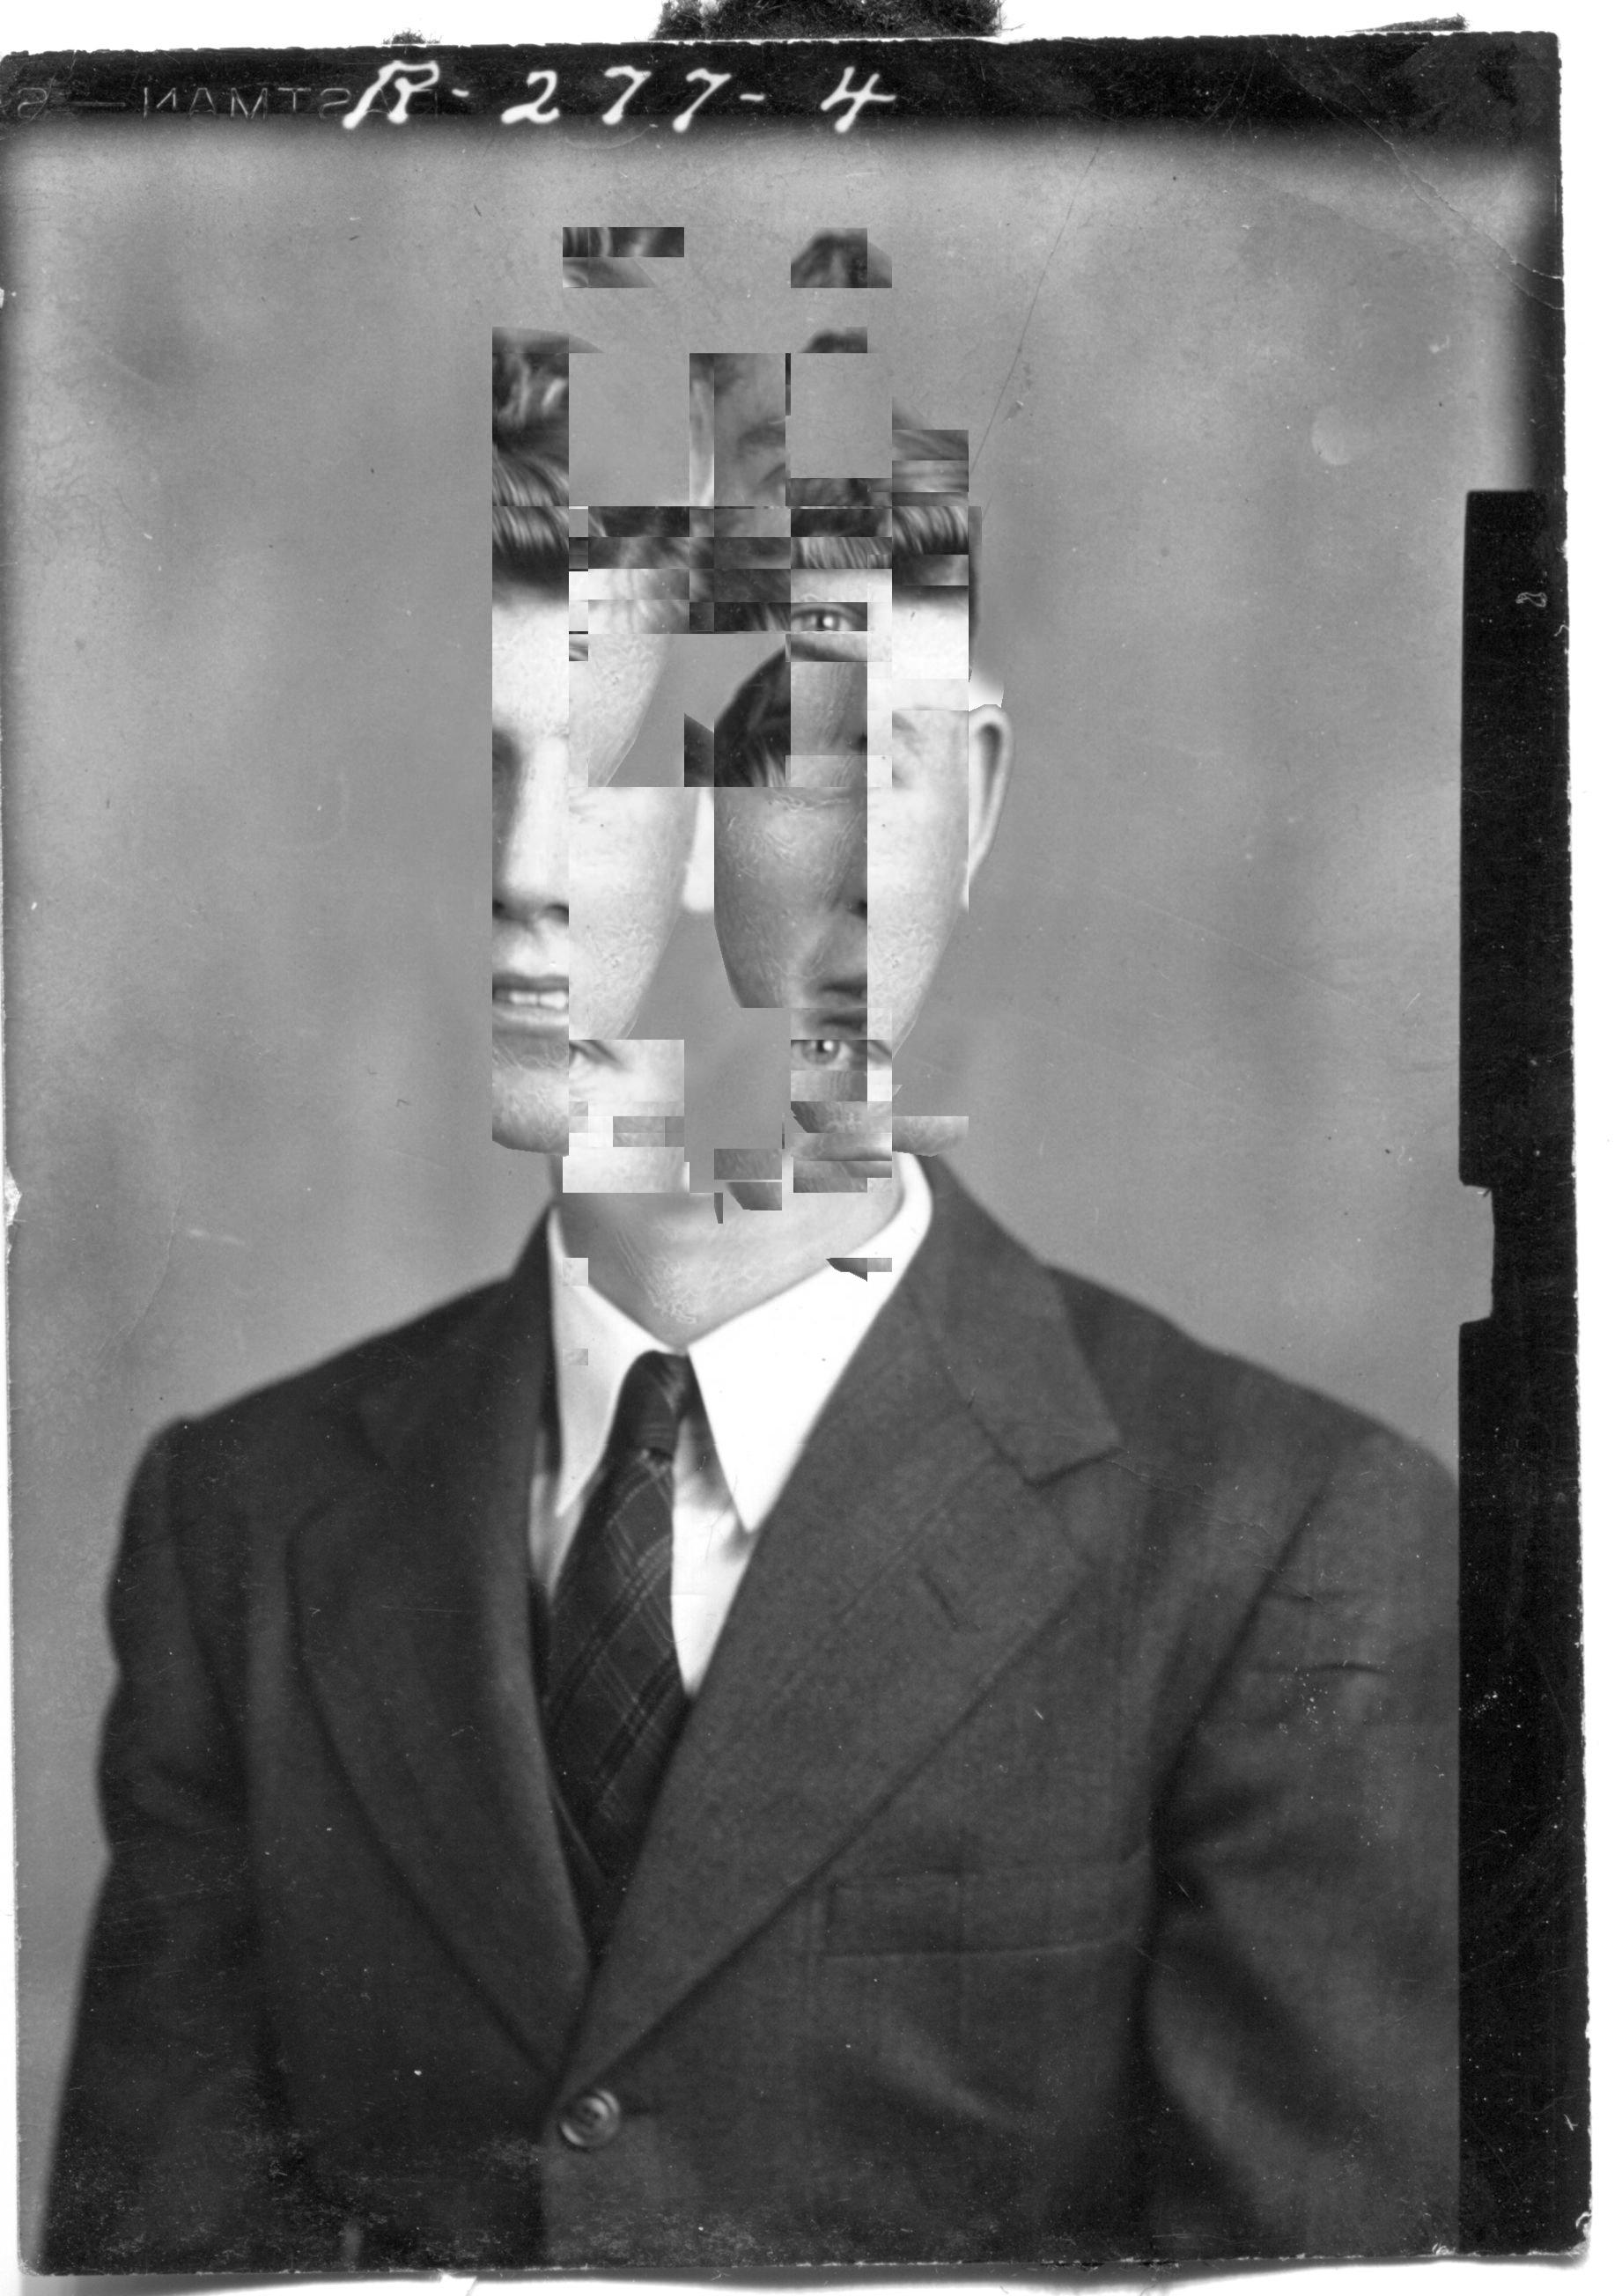 david szauder black white digital